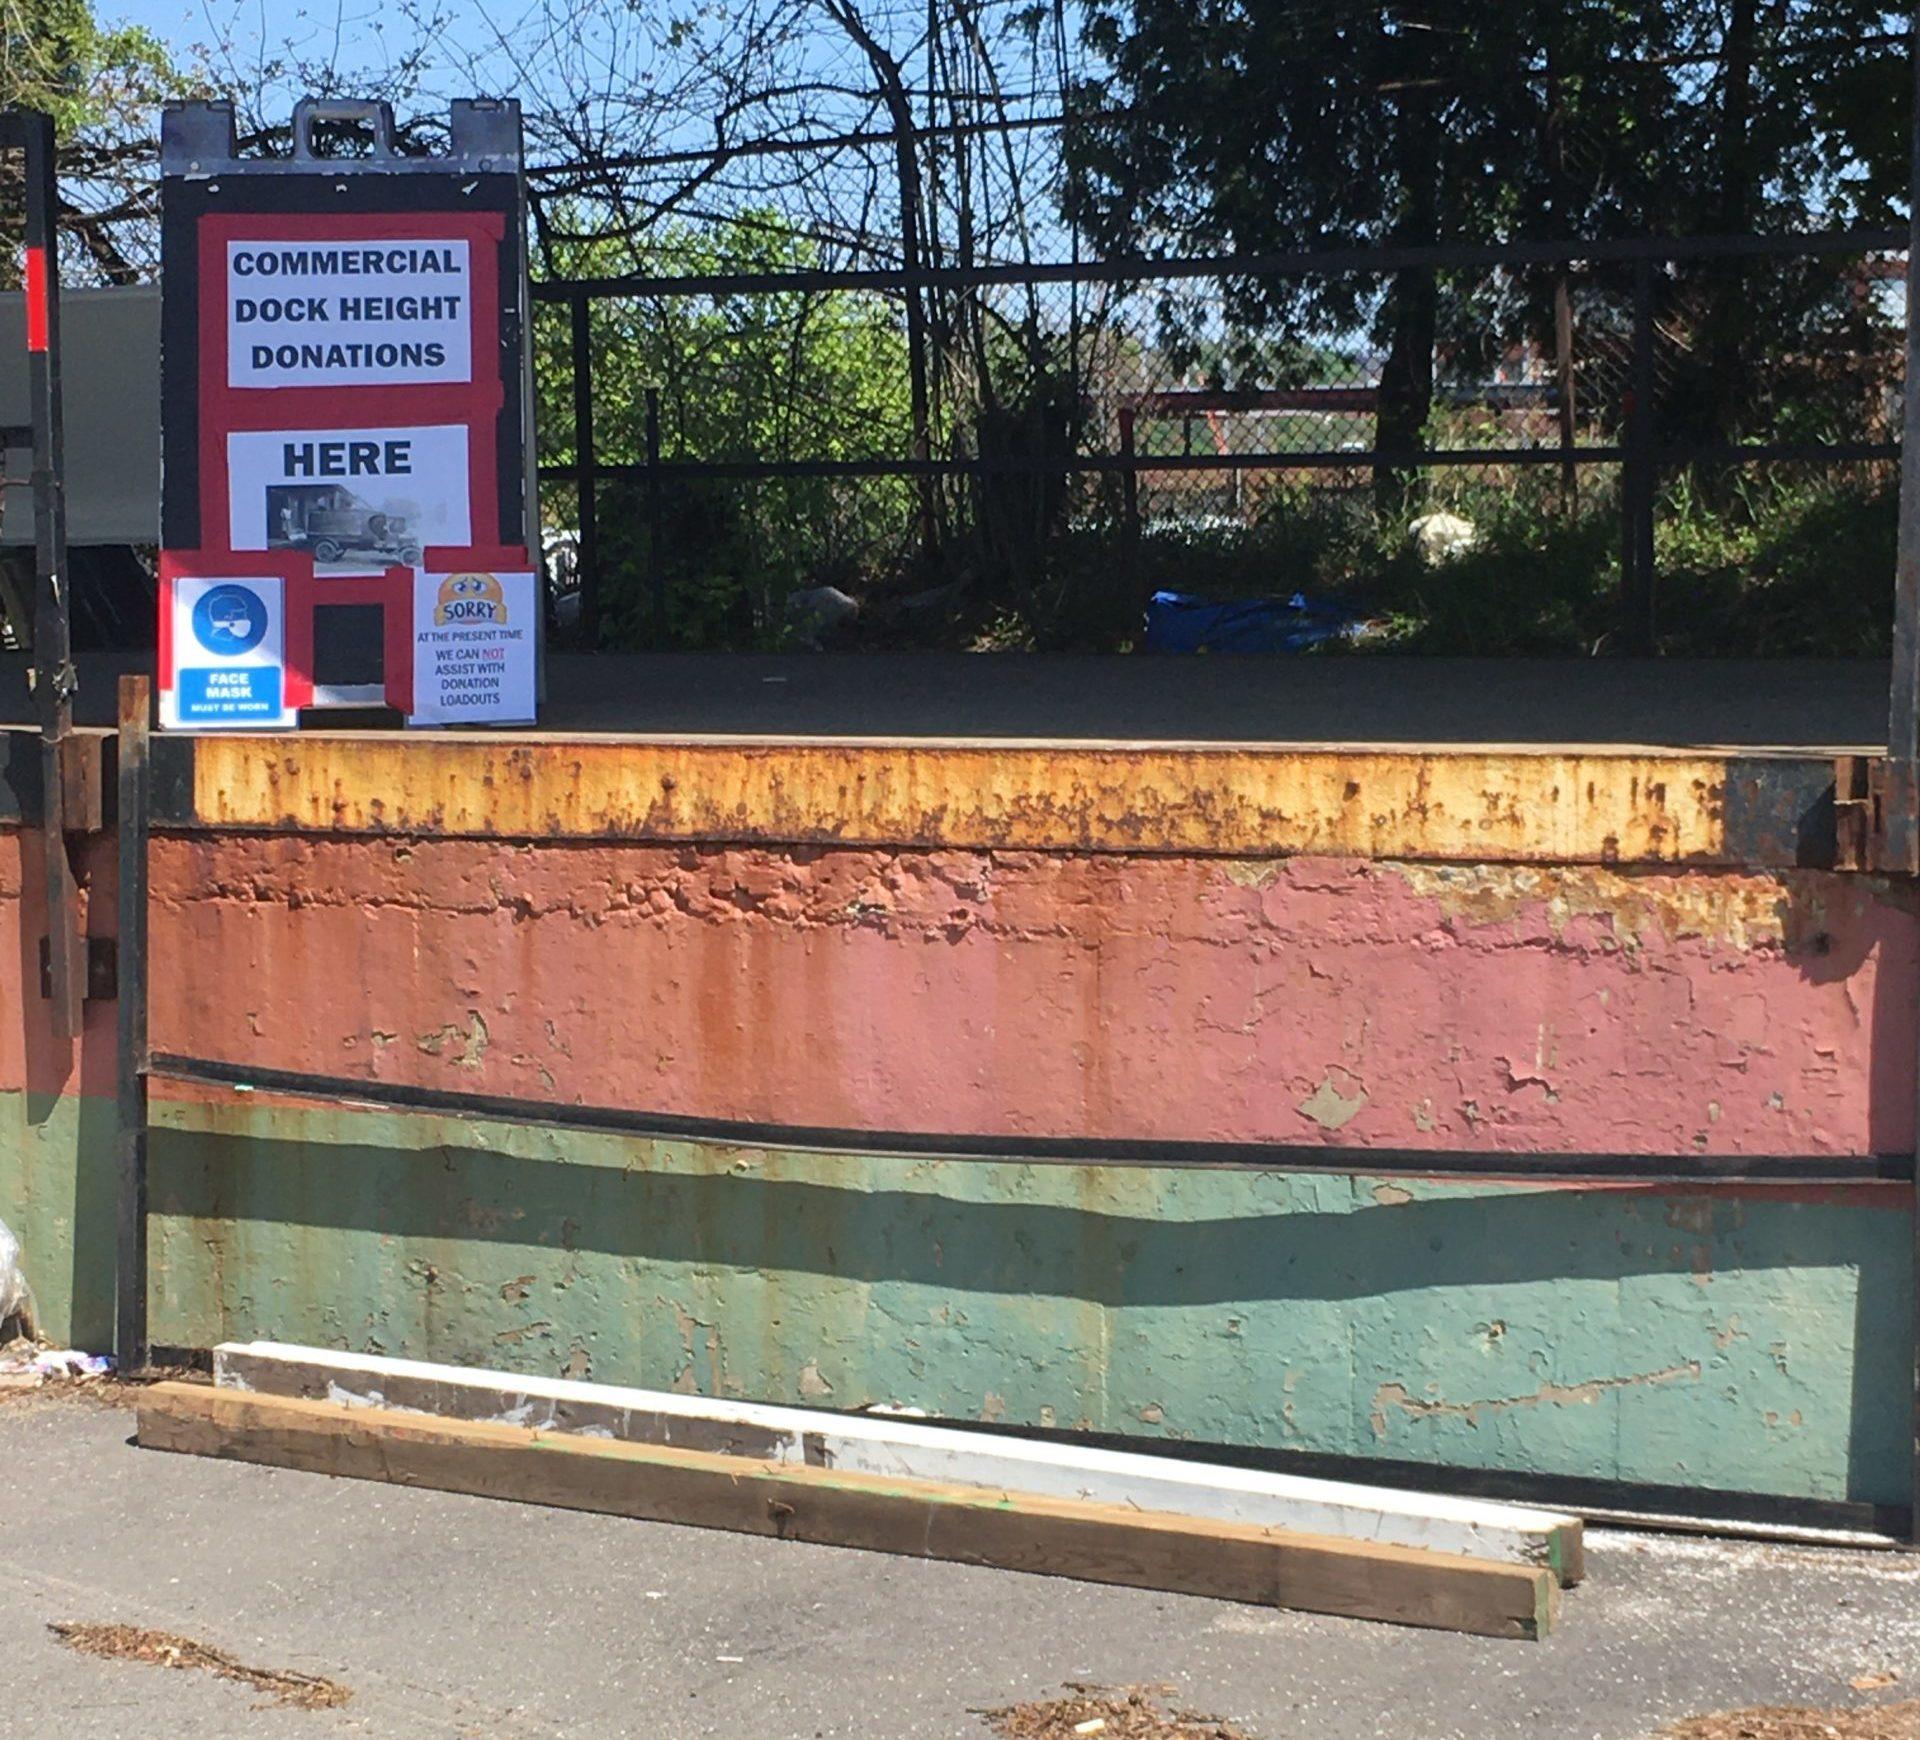 Jetty Dock Height Donation Area